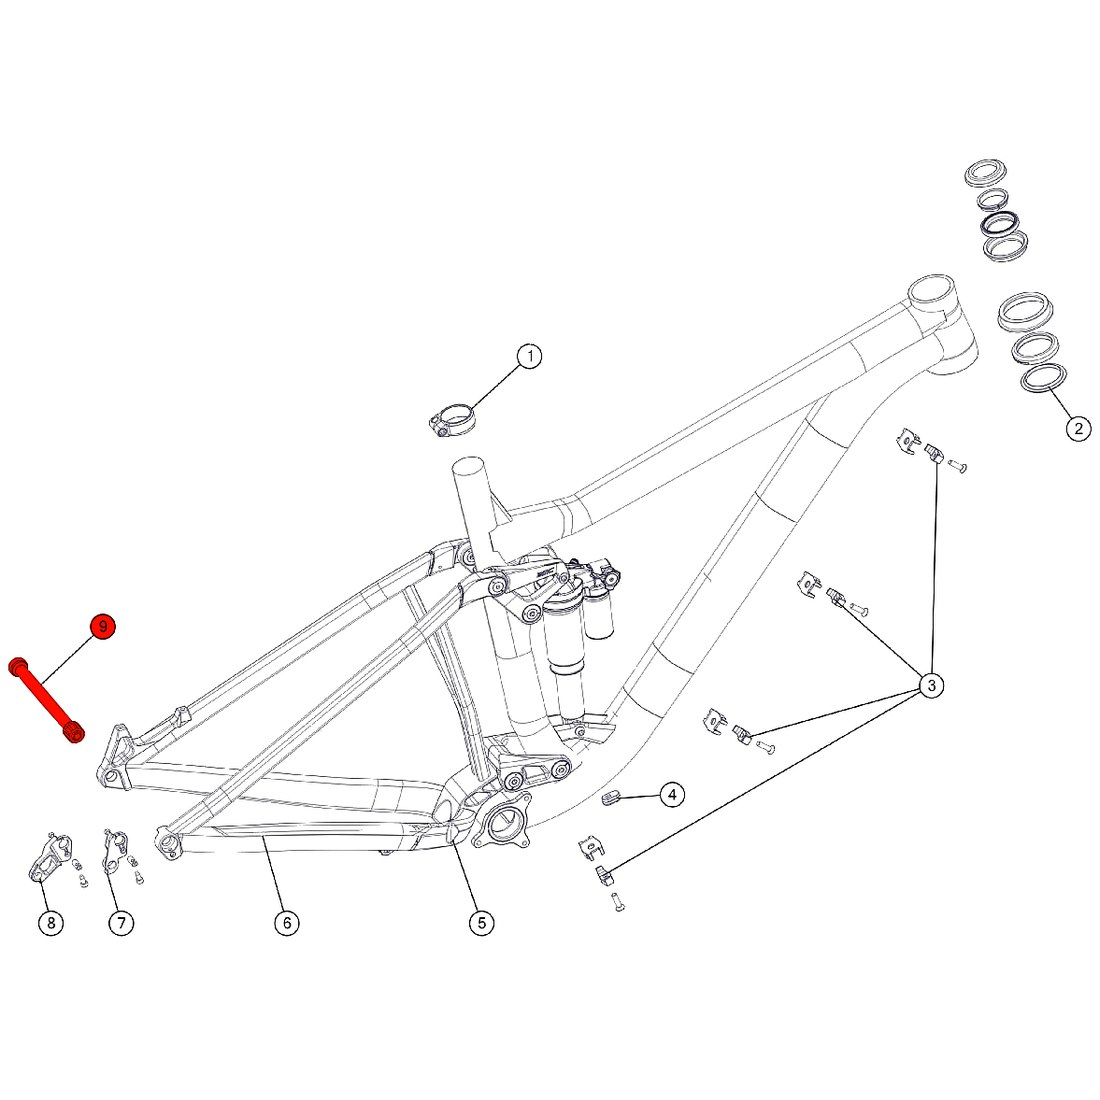 Image of BMC Thru Axle for Trailfox 02 / 03 (MY 2018) - Boost 12x148mm - 301188